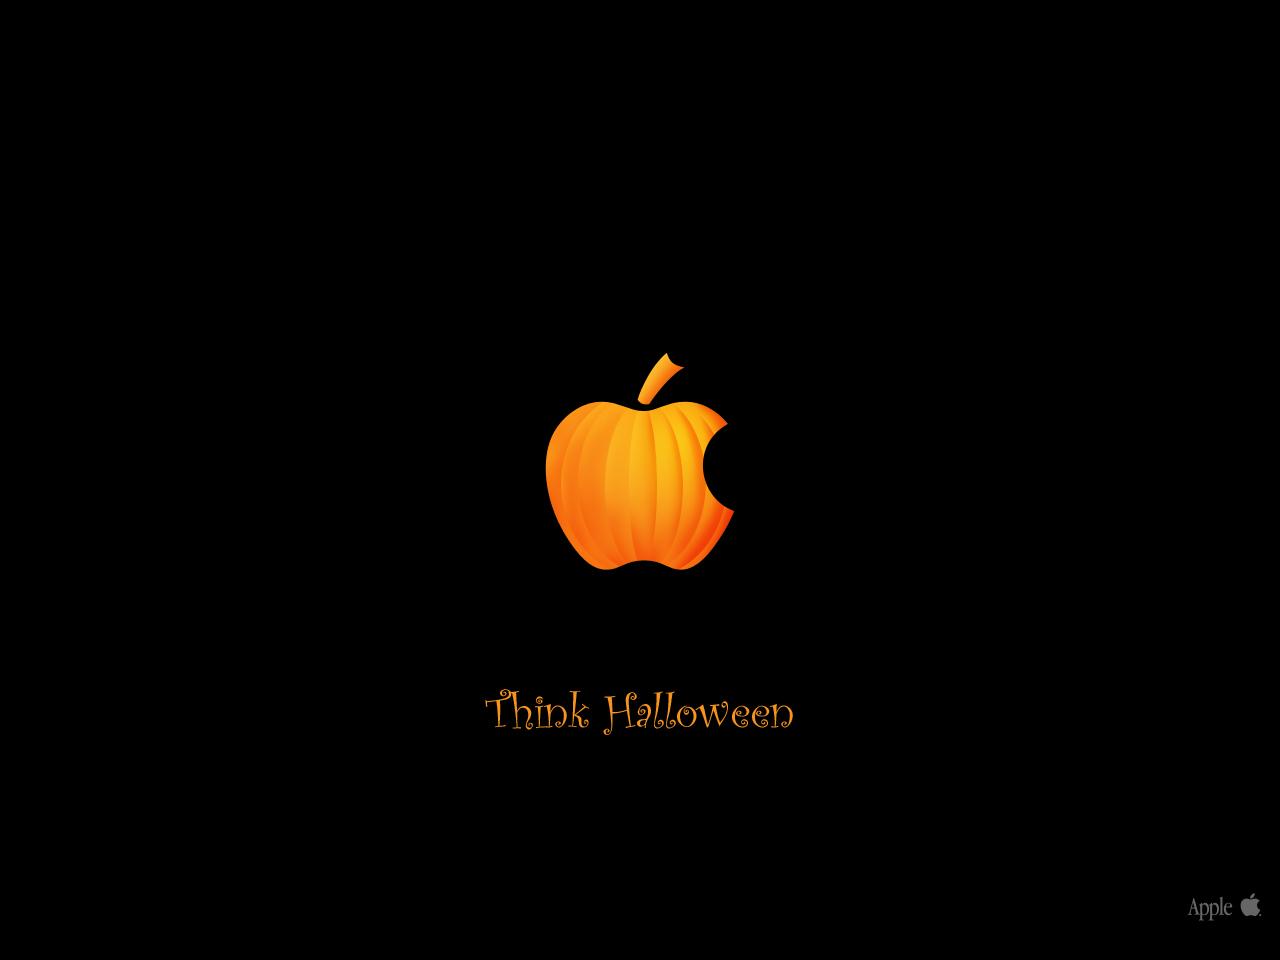 free halloween wallpapers hd